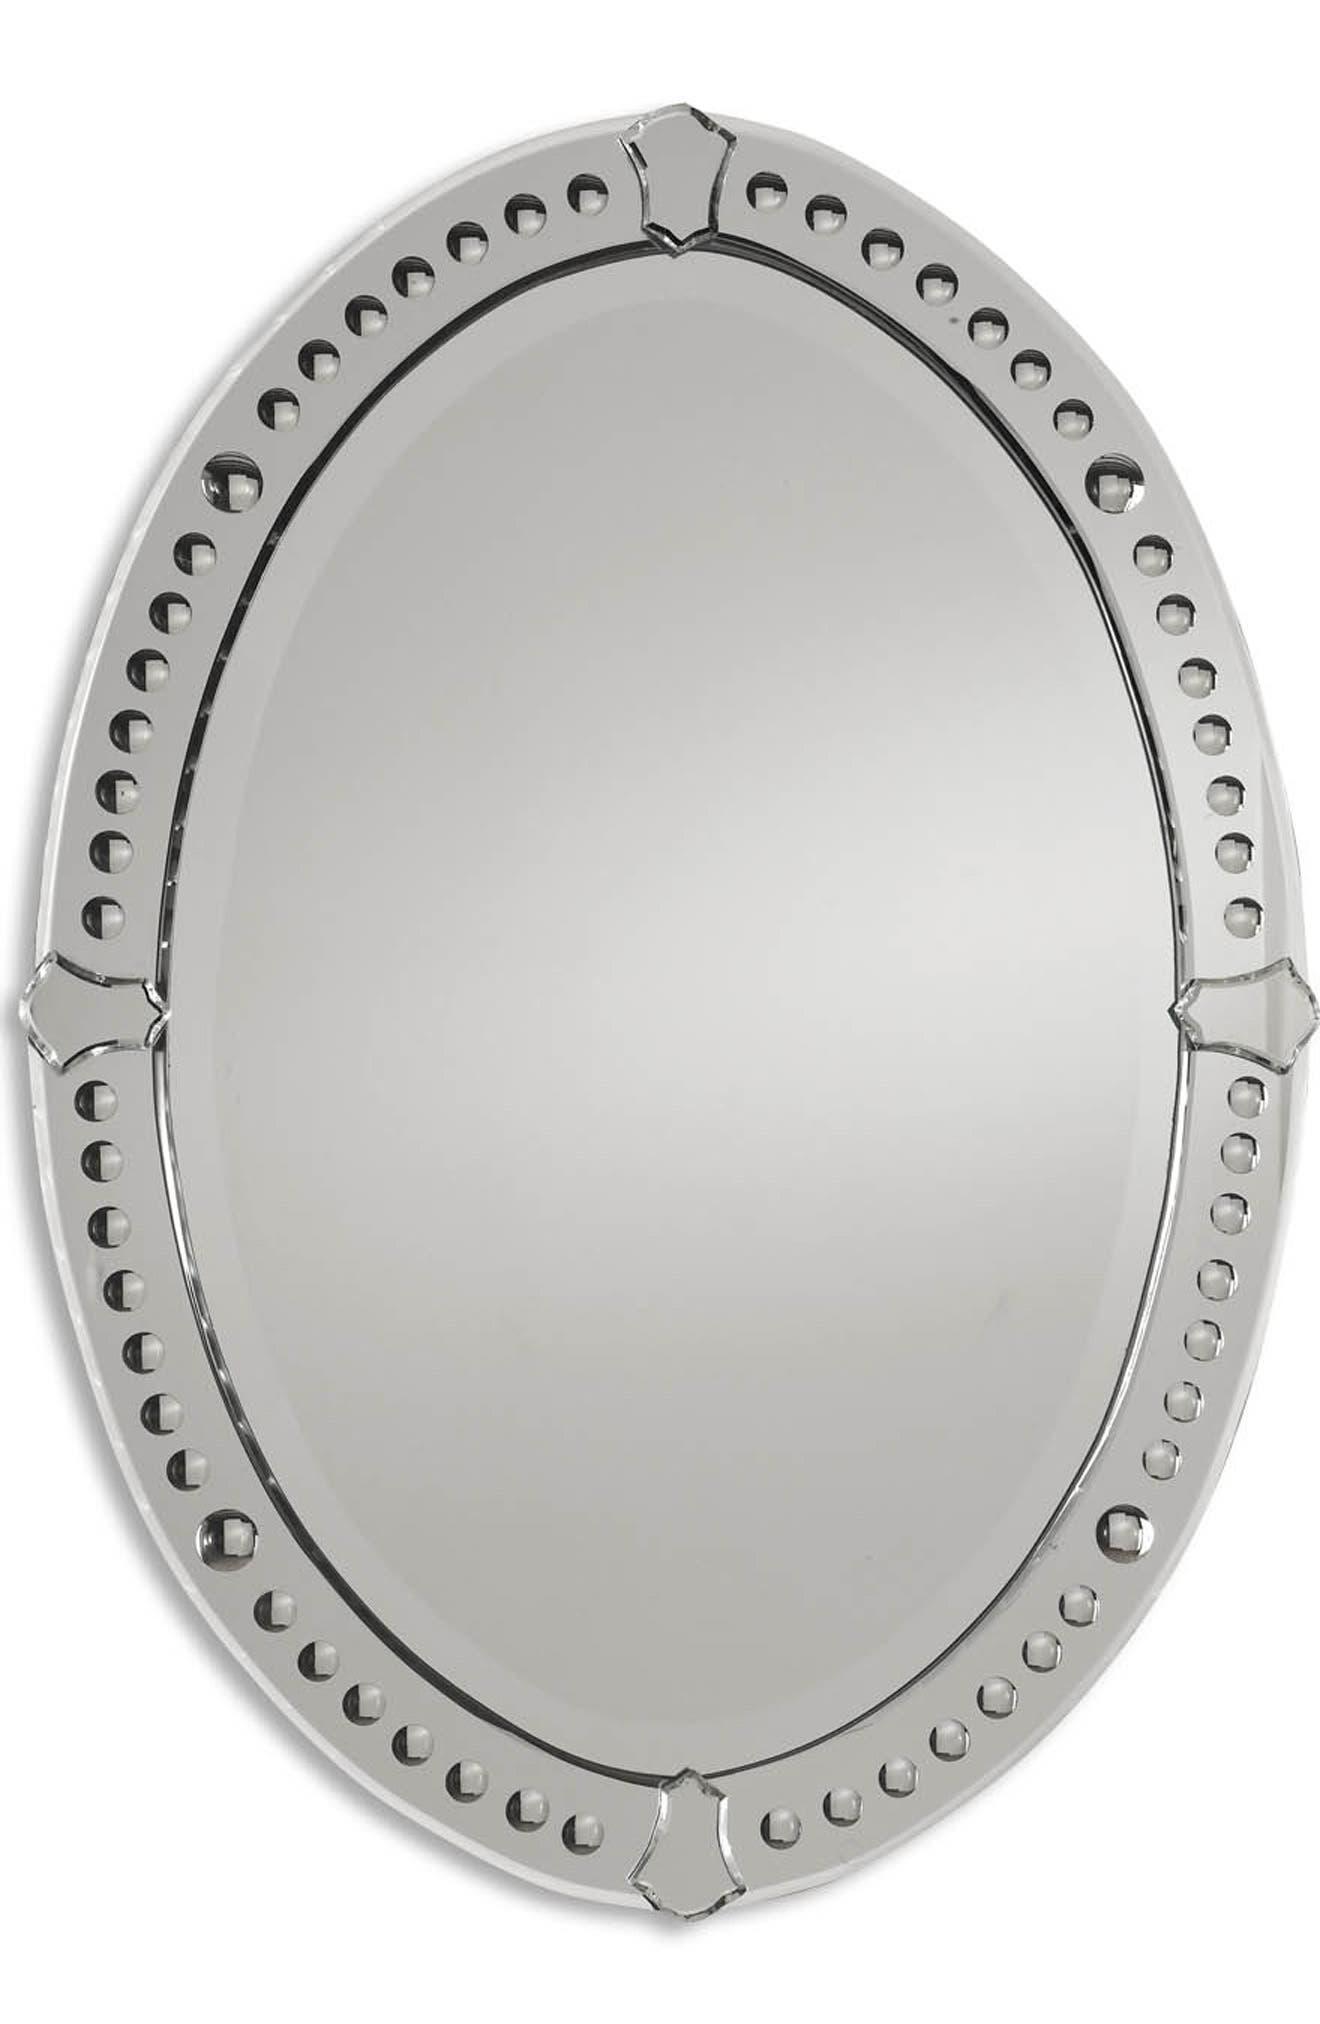 'Graziano' Frameless Oval Mirror,                             Alternate thumbnail 3, color,                             200